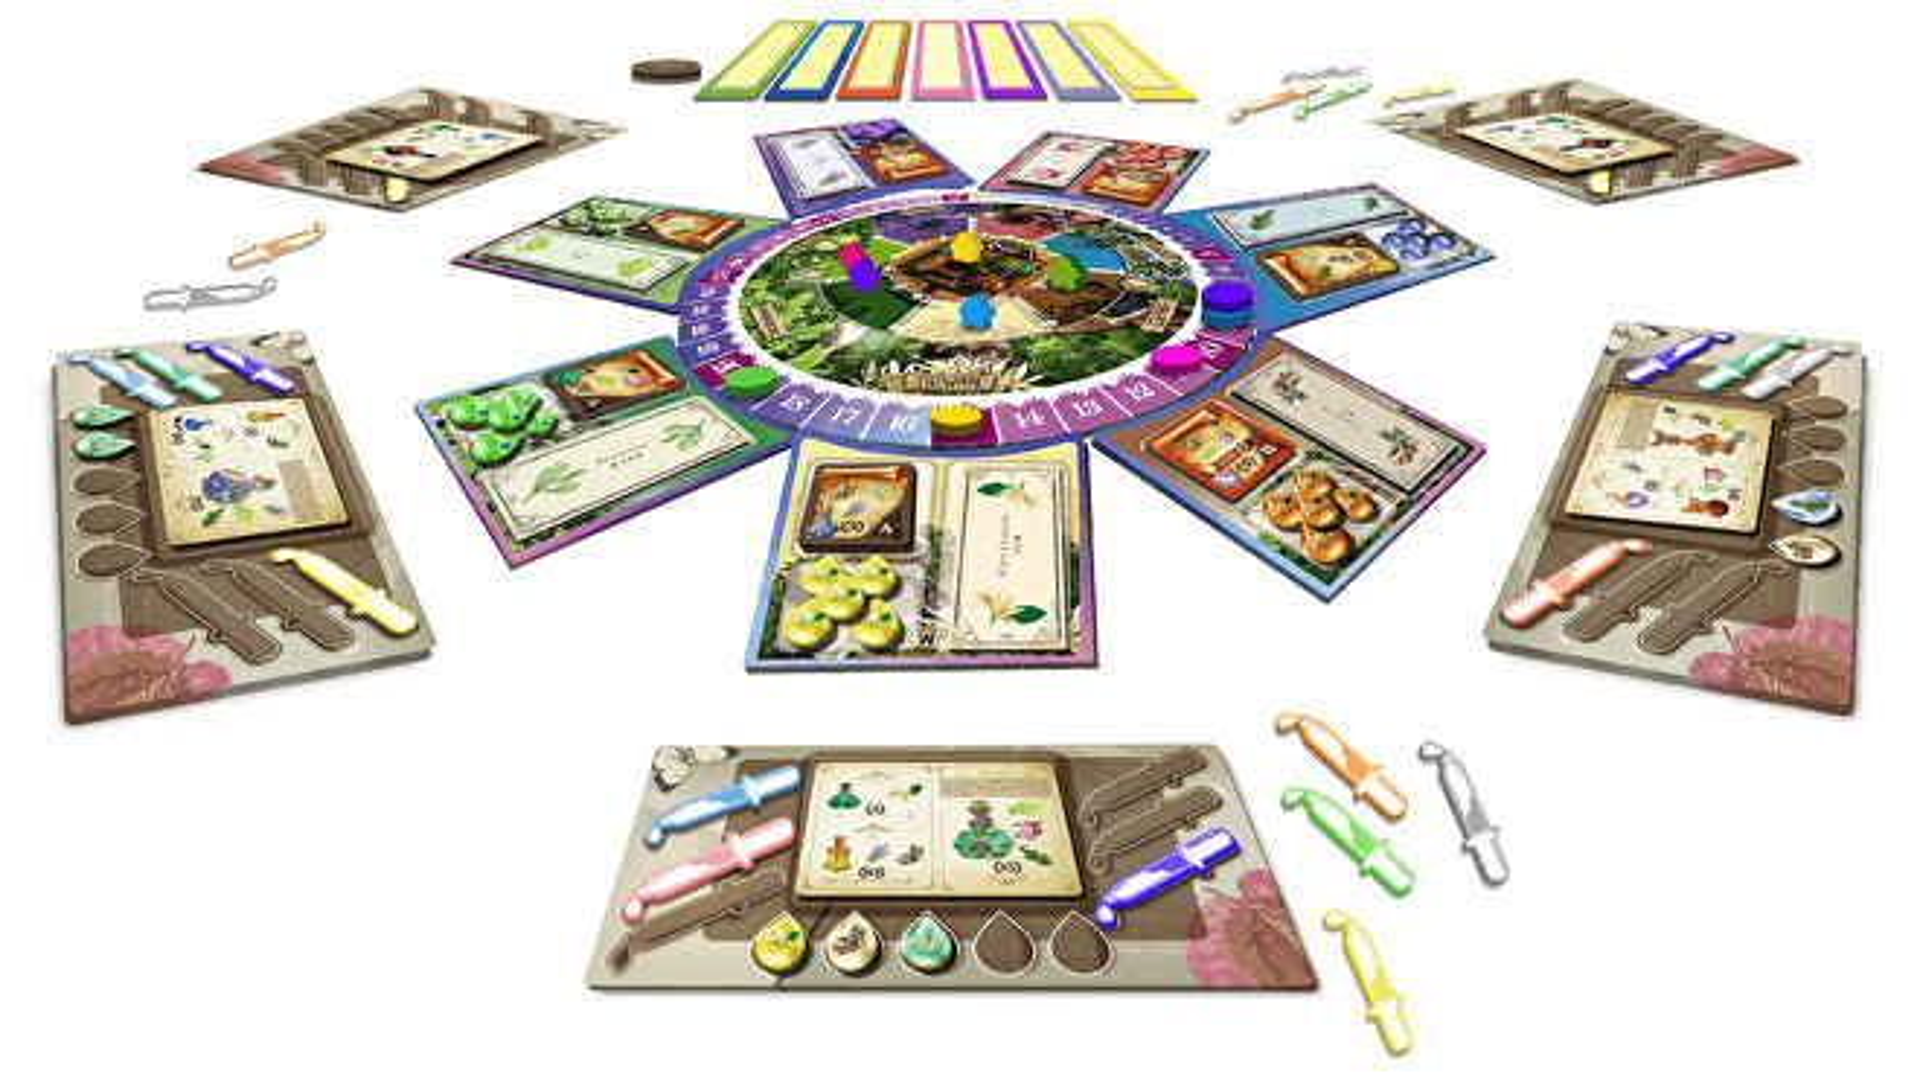 the-perfumer-board-game-gameplay-layout.jpg